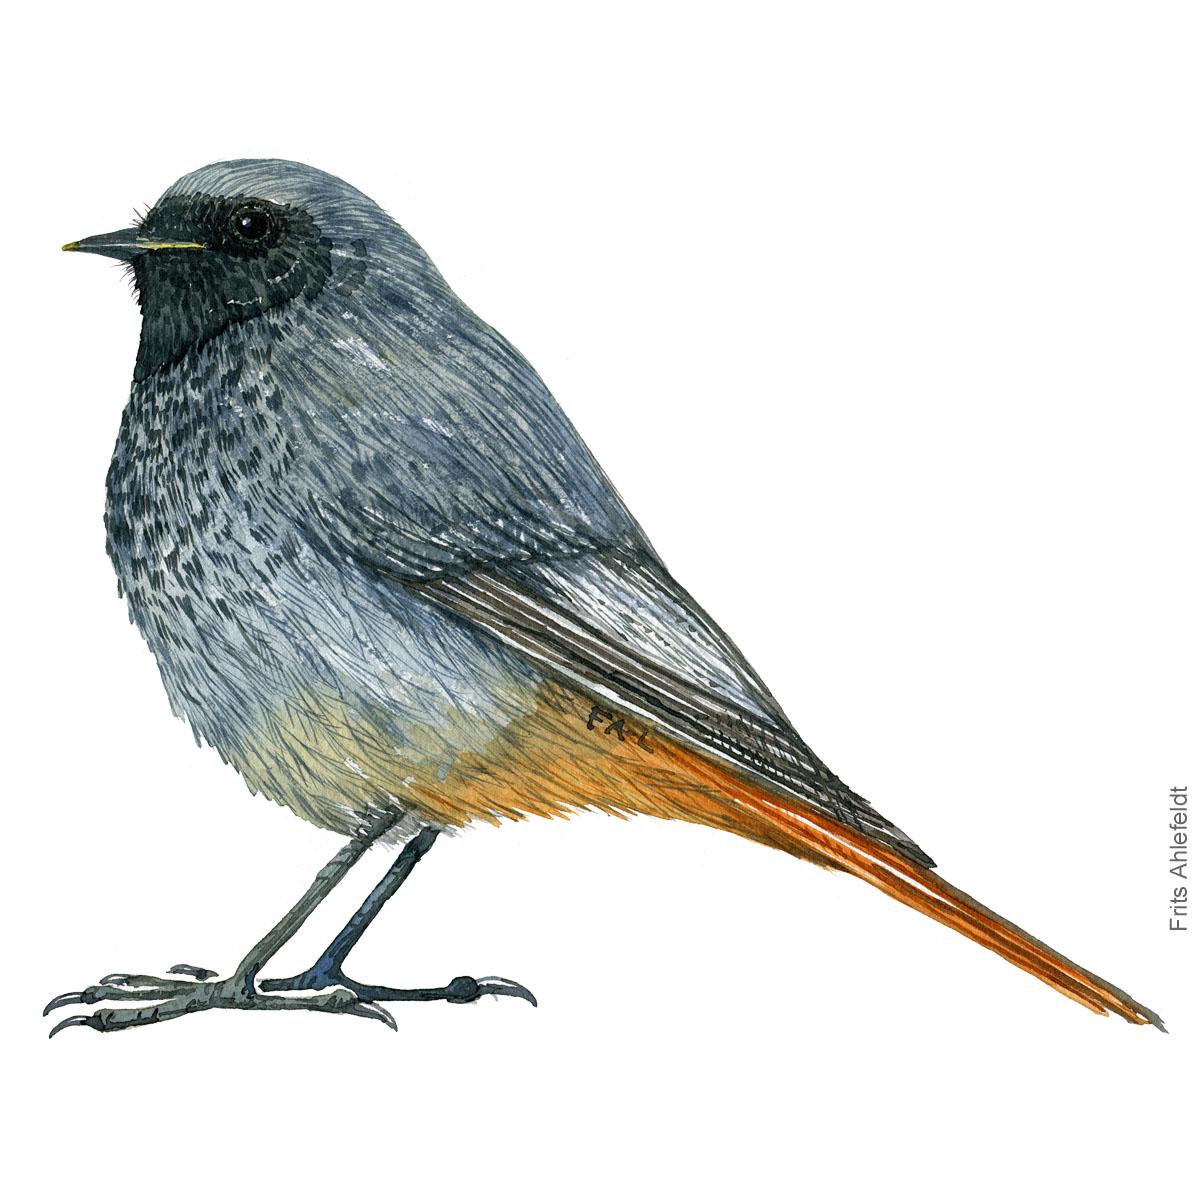 Husroedstjert - Black redstart - Bird painting in watercolor by Frits Ahlefeldt - Fugle akvarel